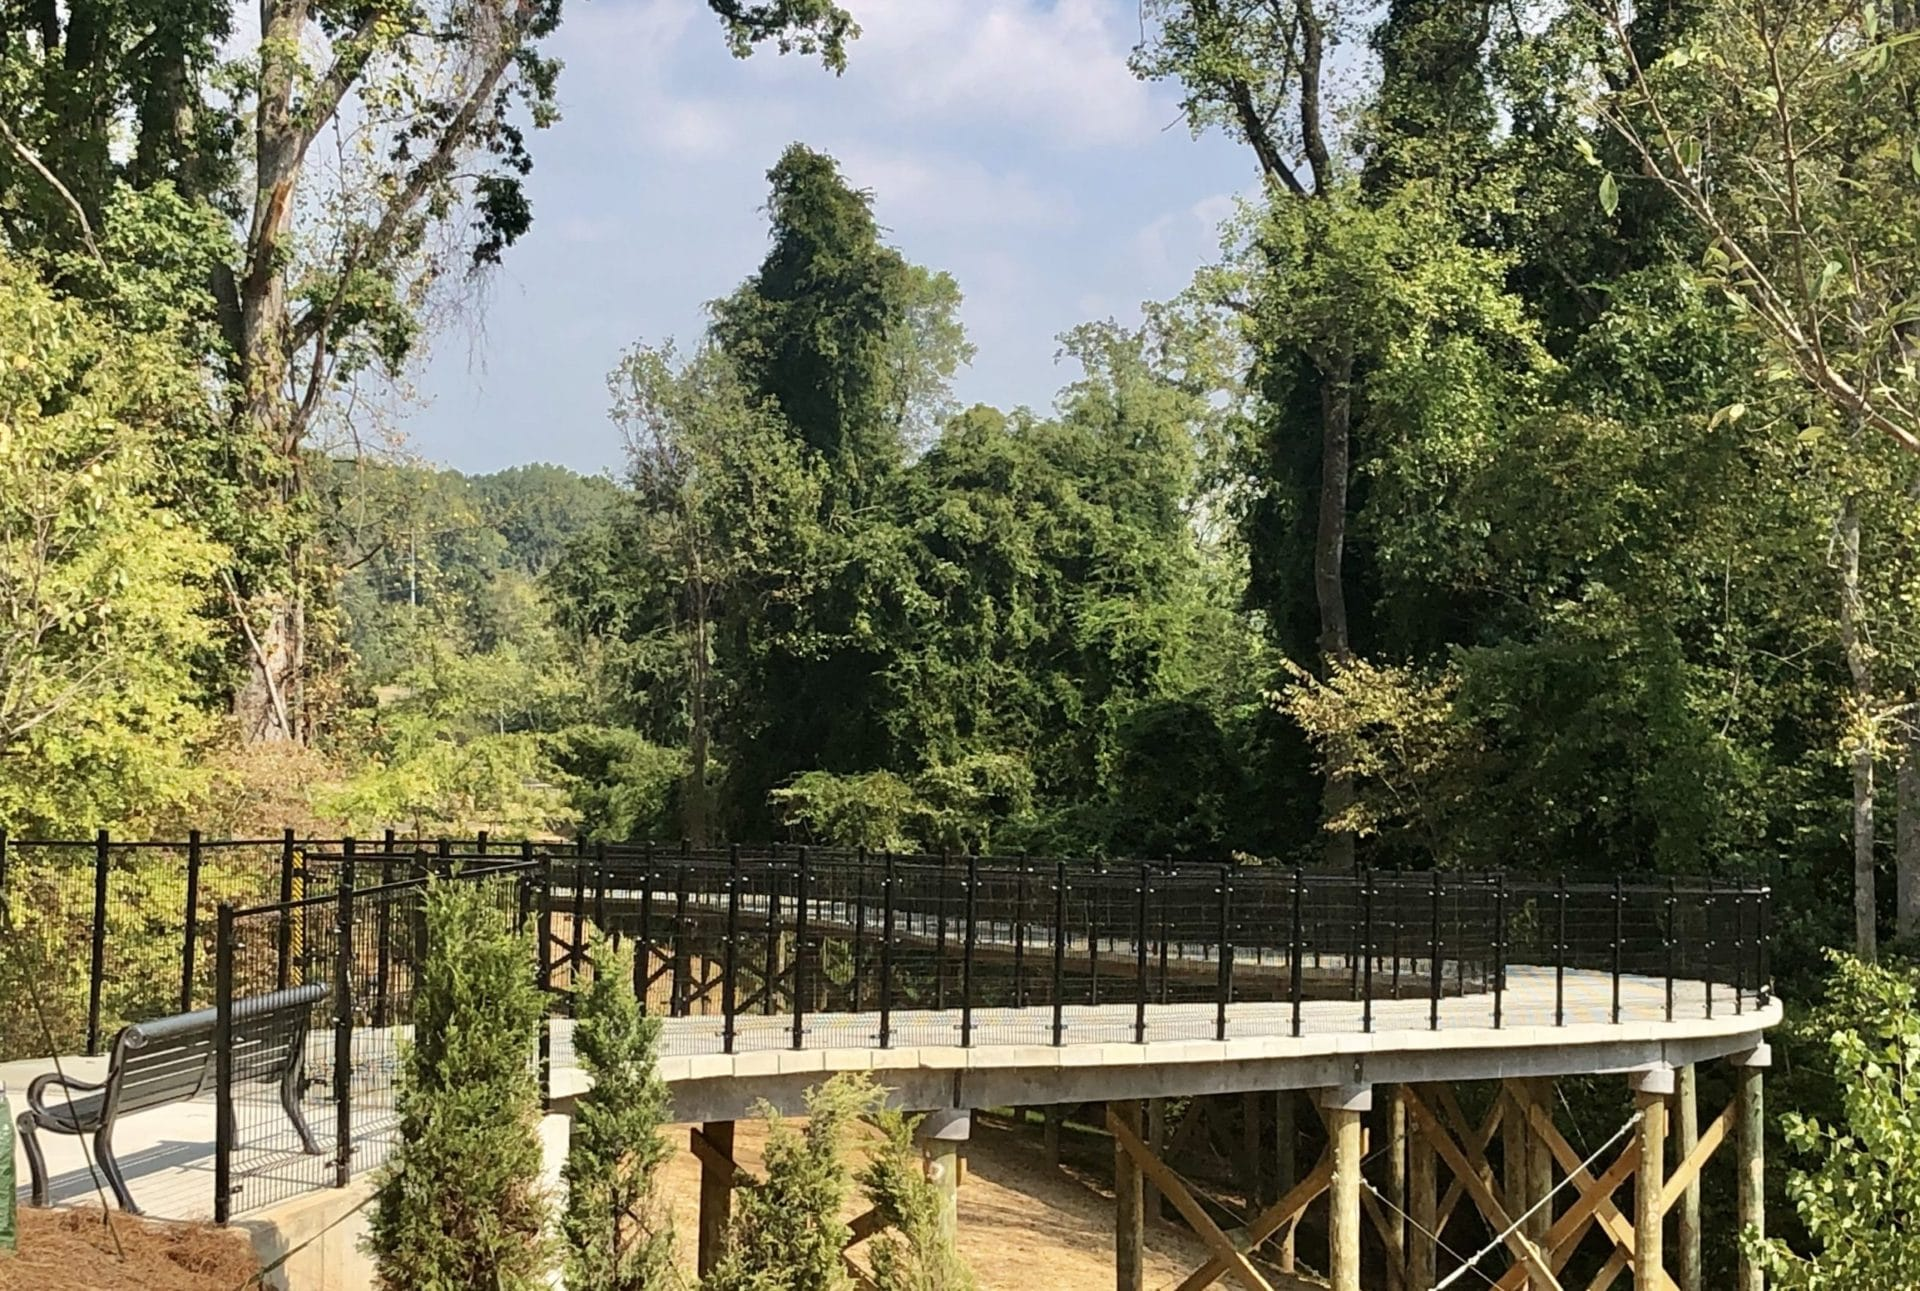 Antiquity greenway